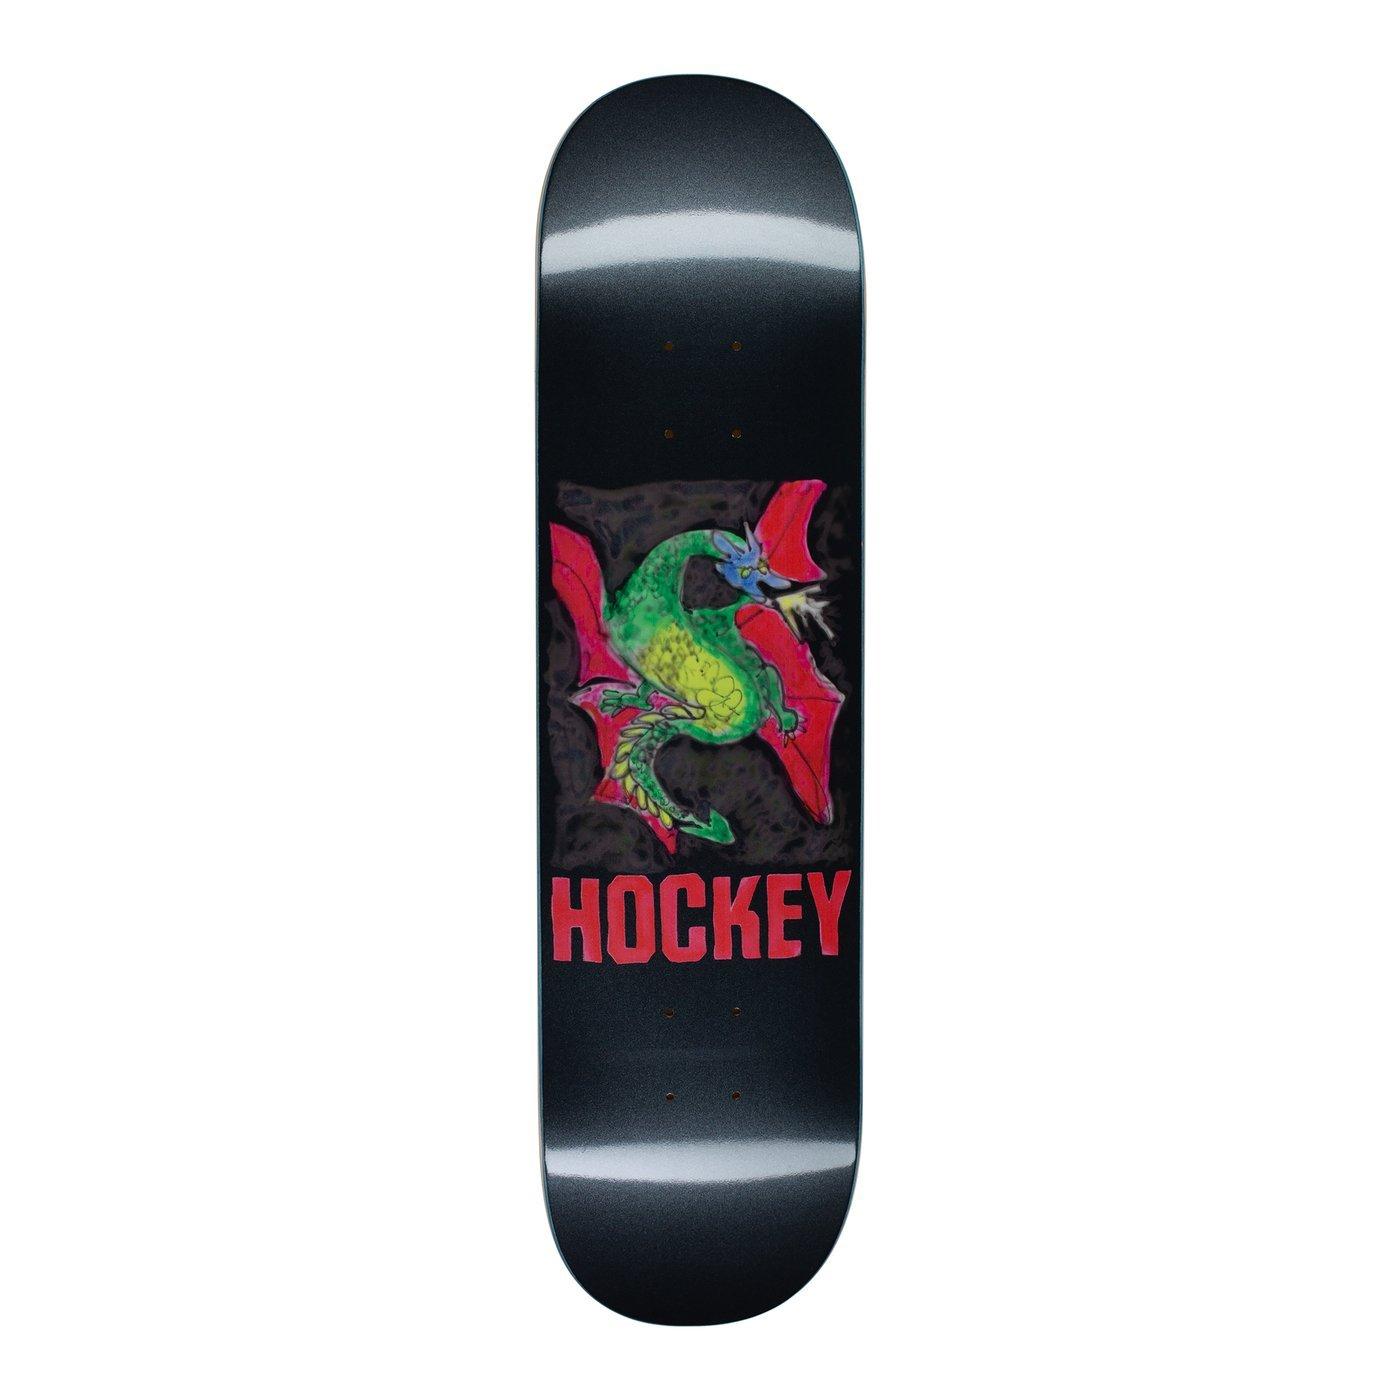 Hockey Air Dragon Ben Kadow 8.25 x 31.79